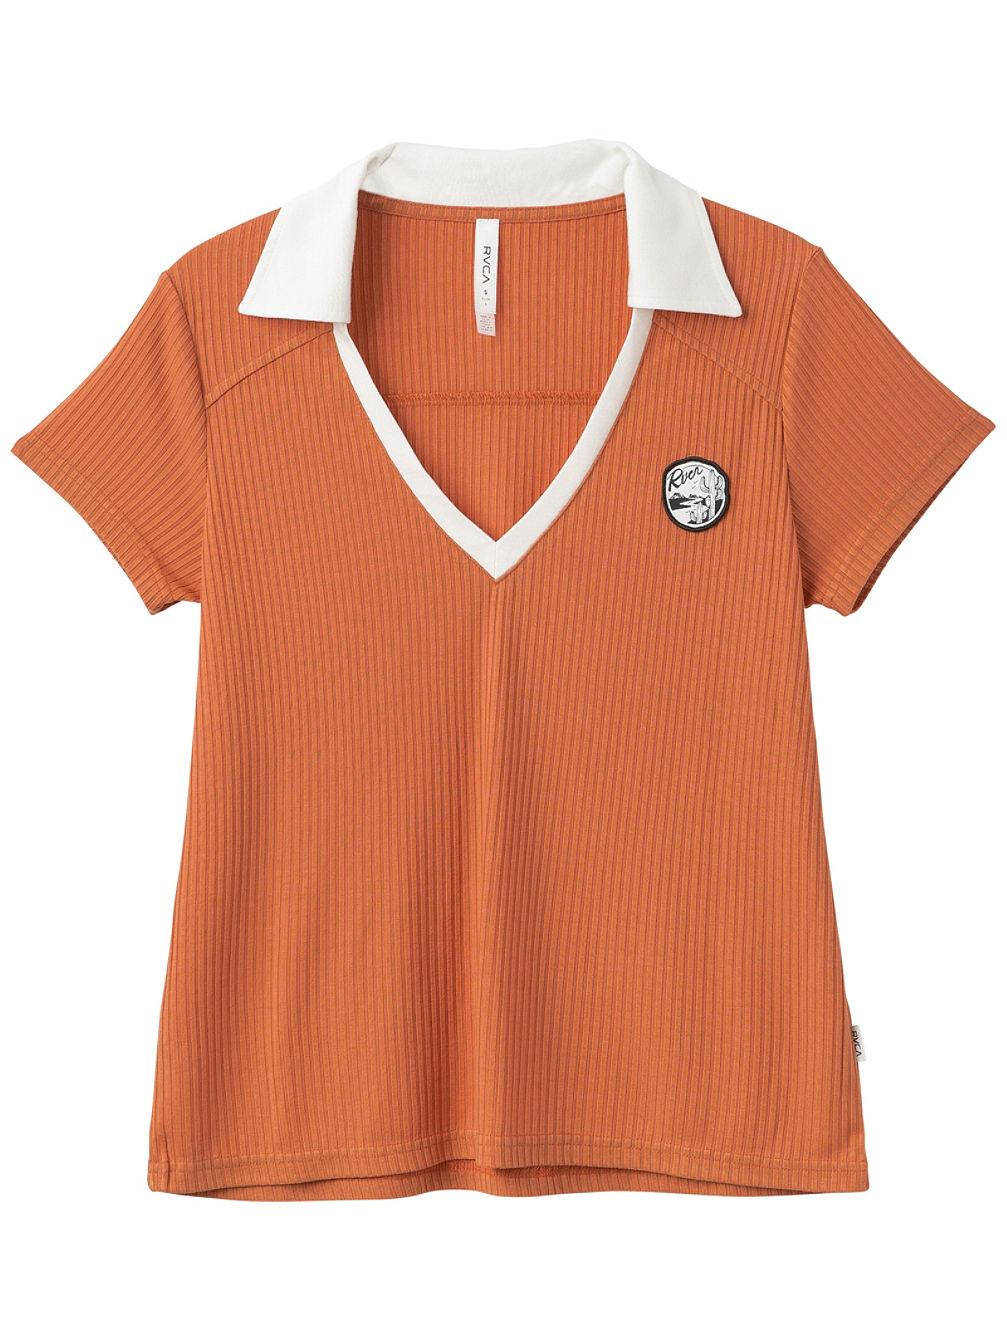 Buy rvca cheap thrills t shirt online at blue for Cheap t shirt online